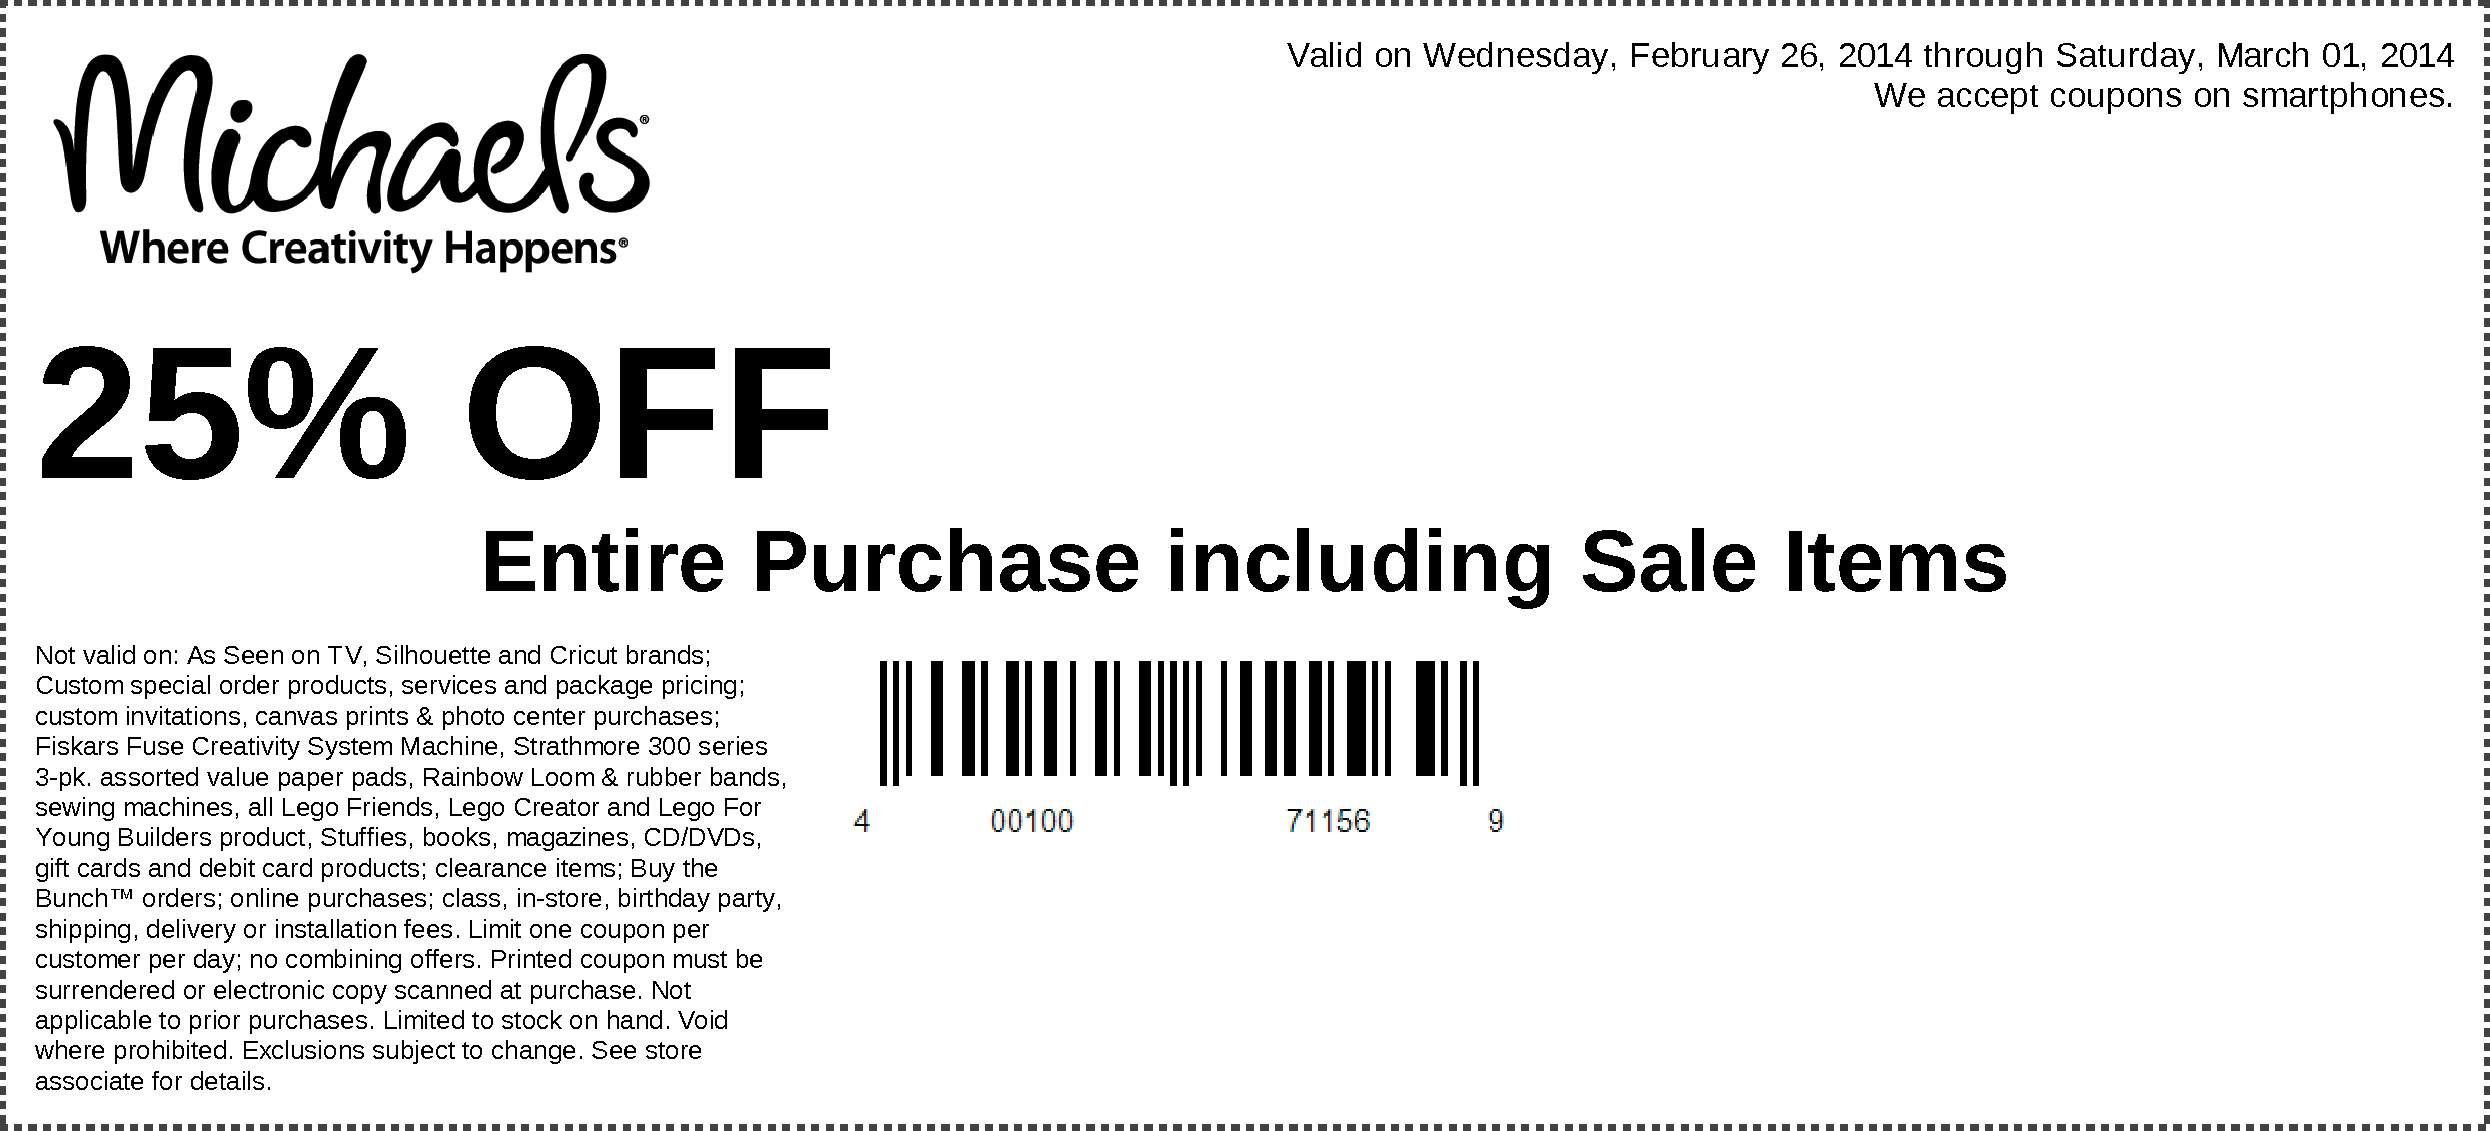 michaels coupon sale items